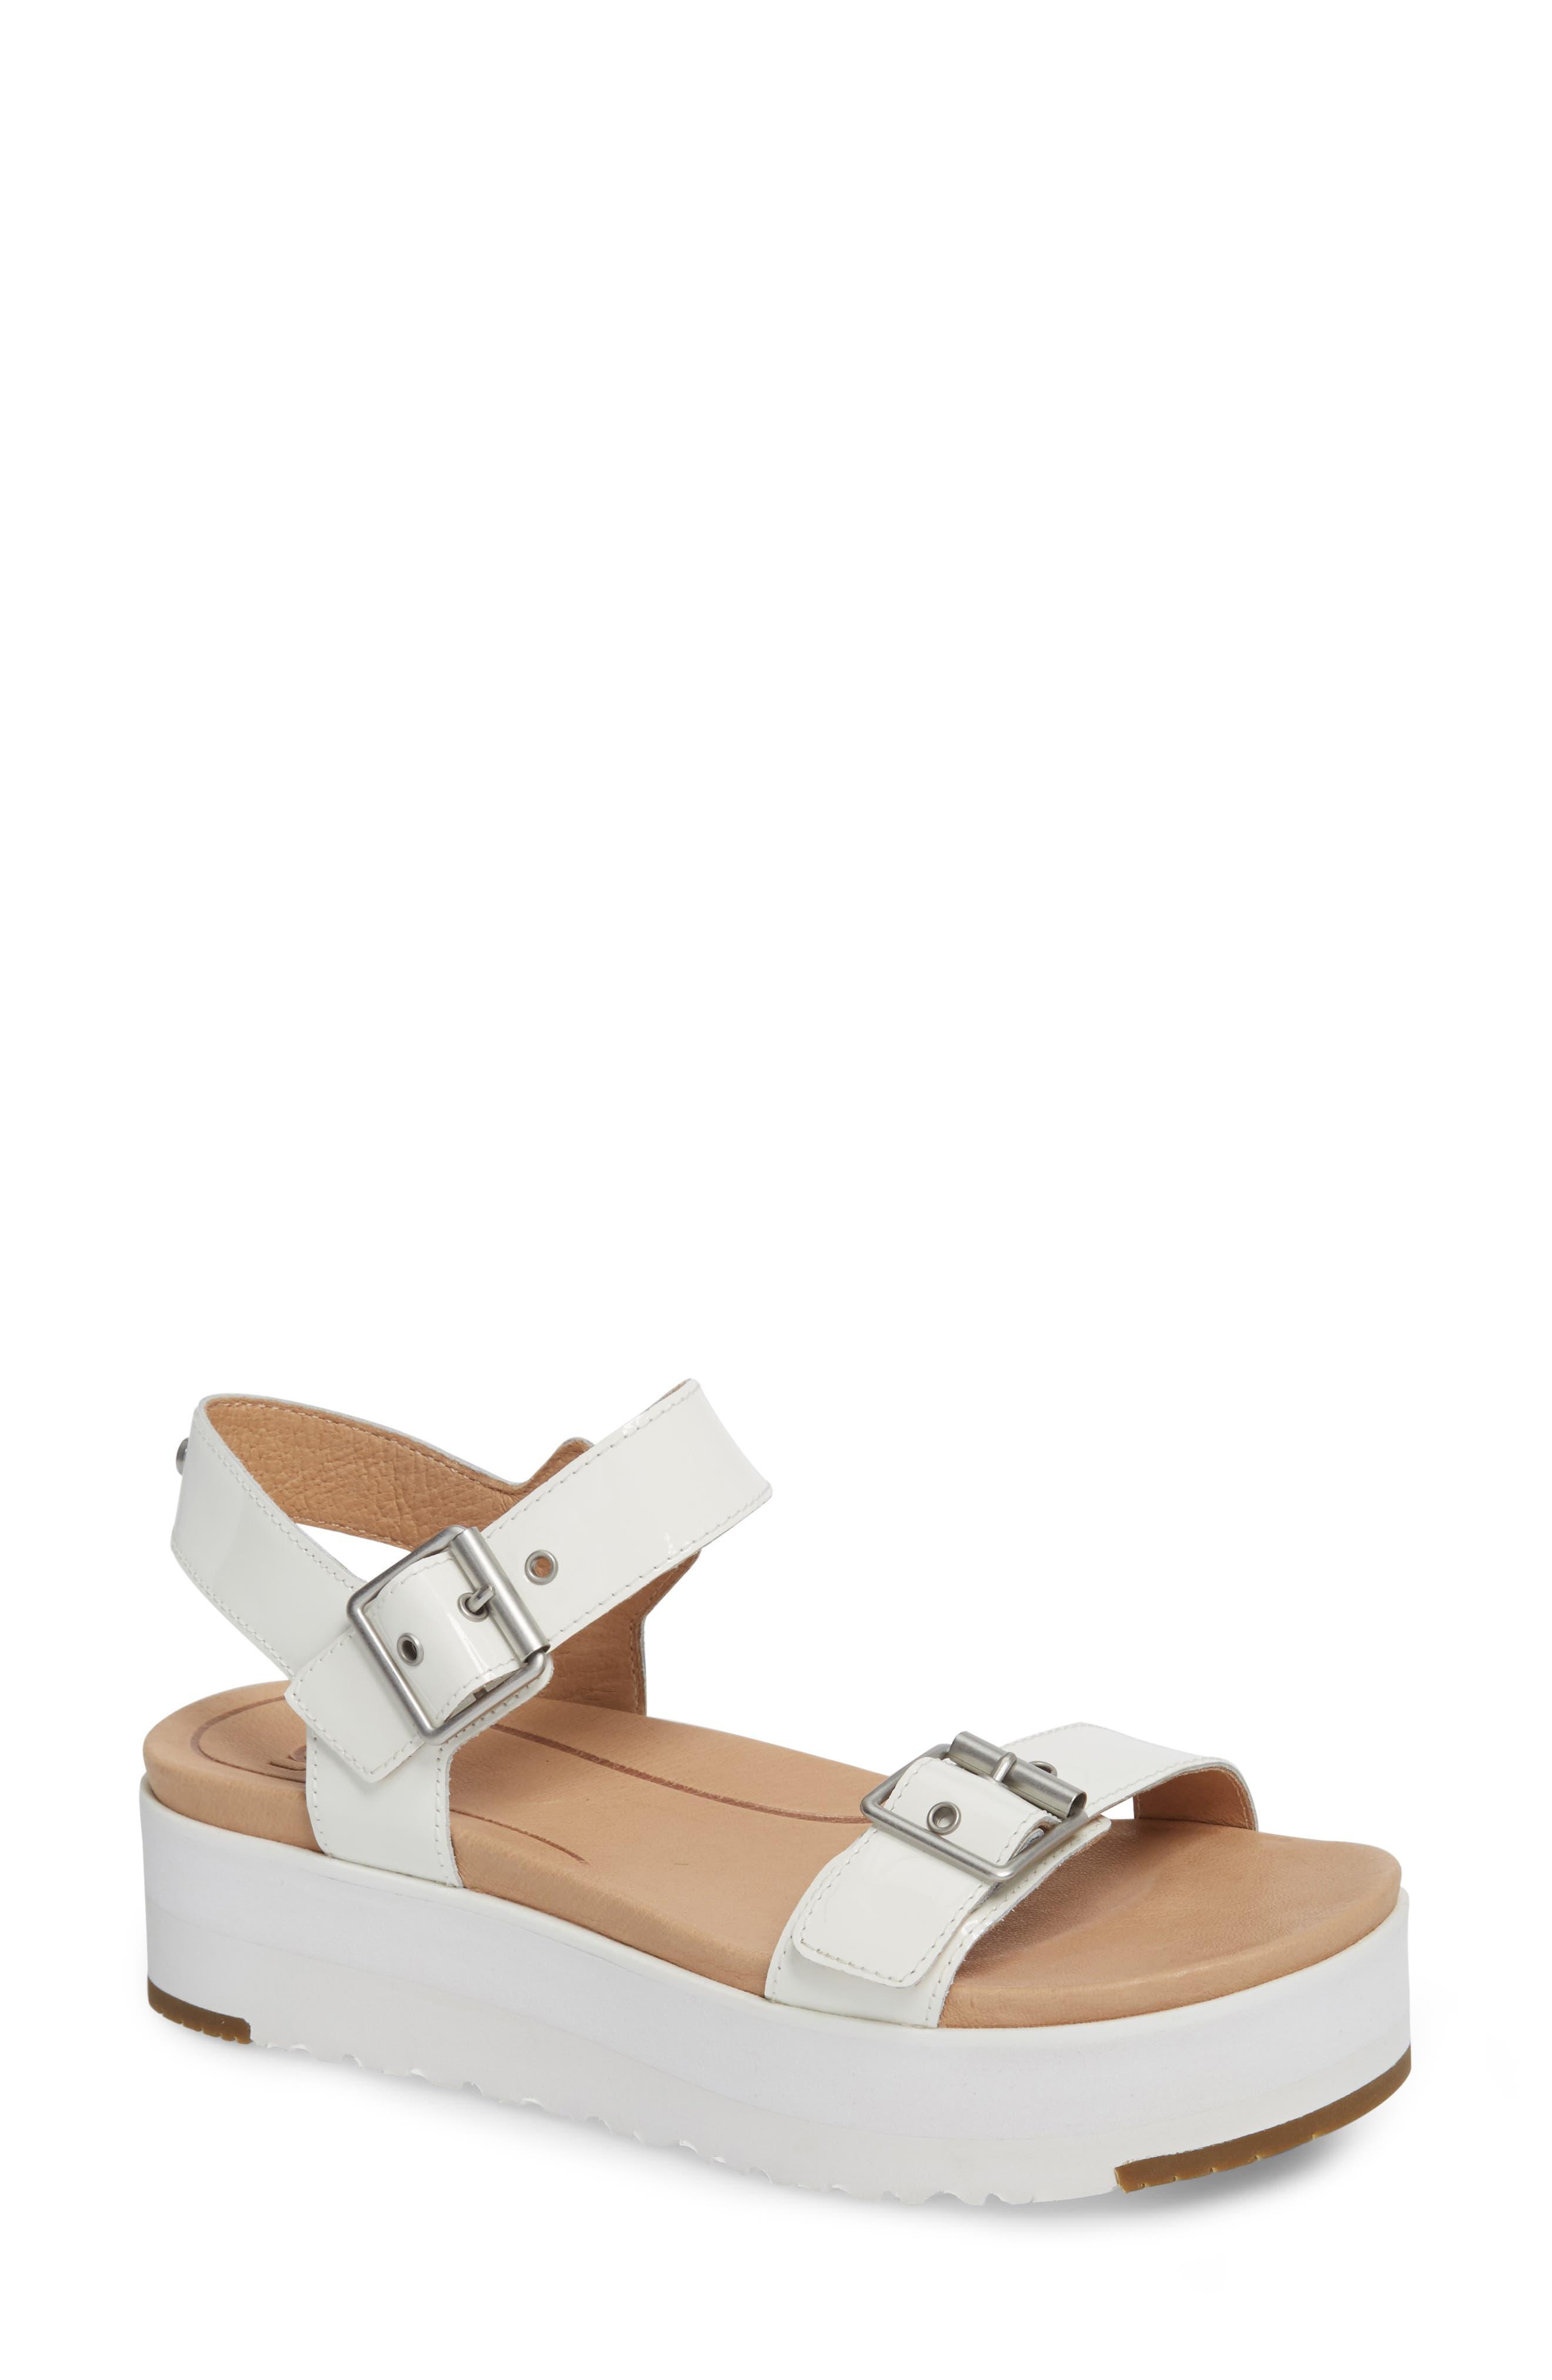 Angie Platform Sandal,                         Main,                         color, White Leather